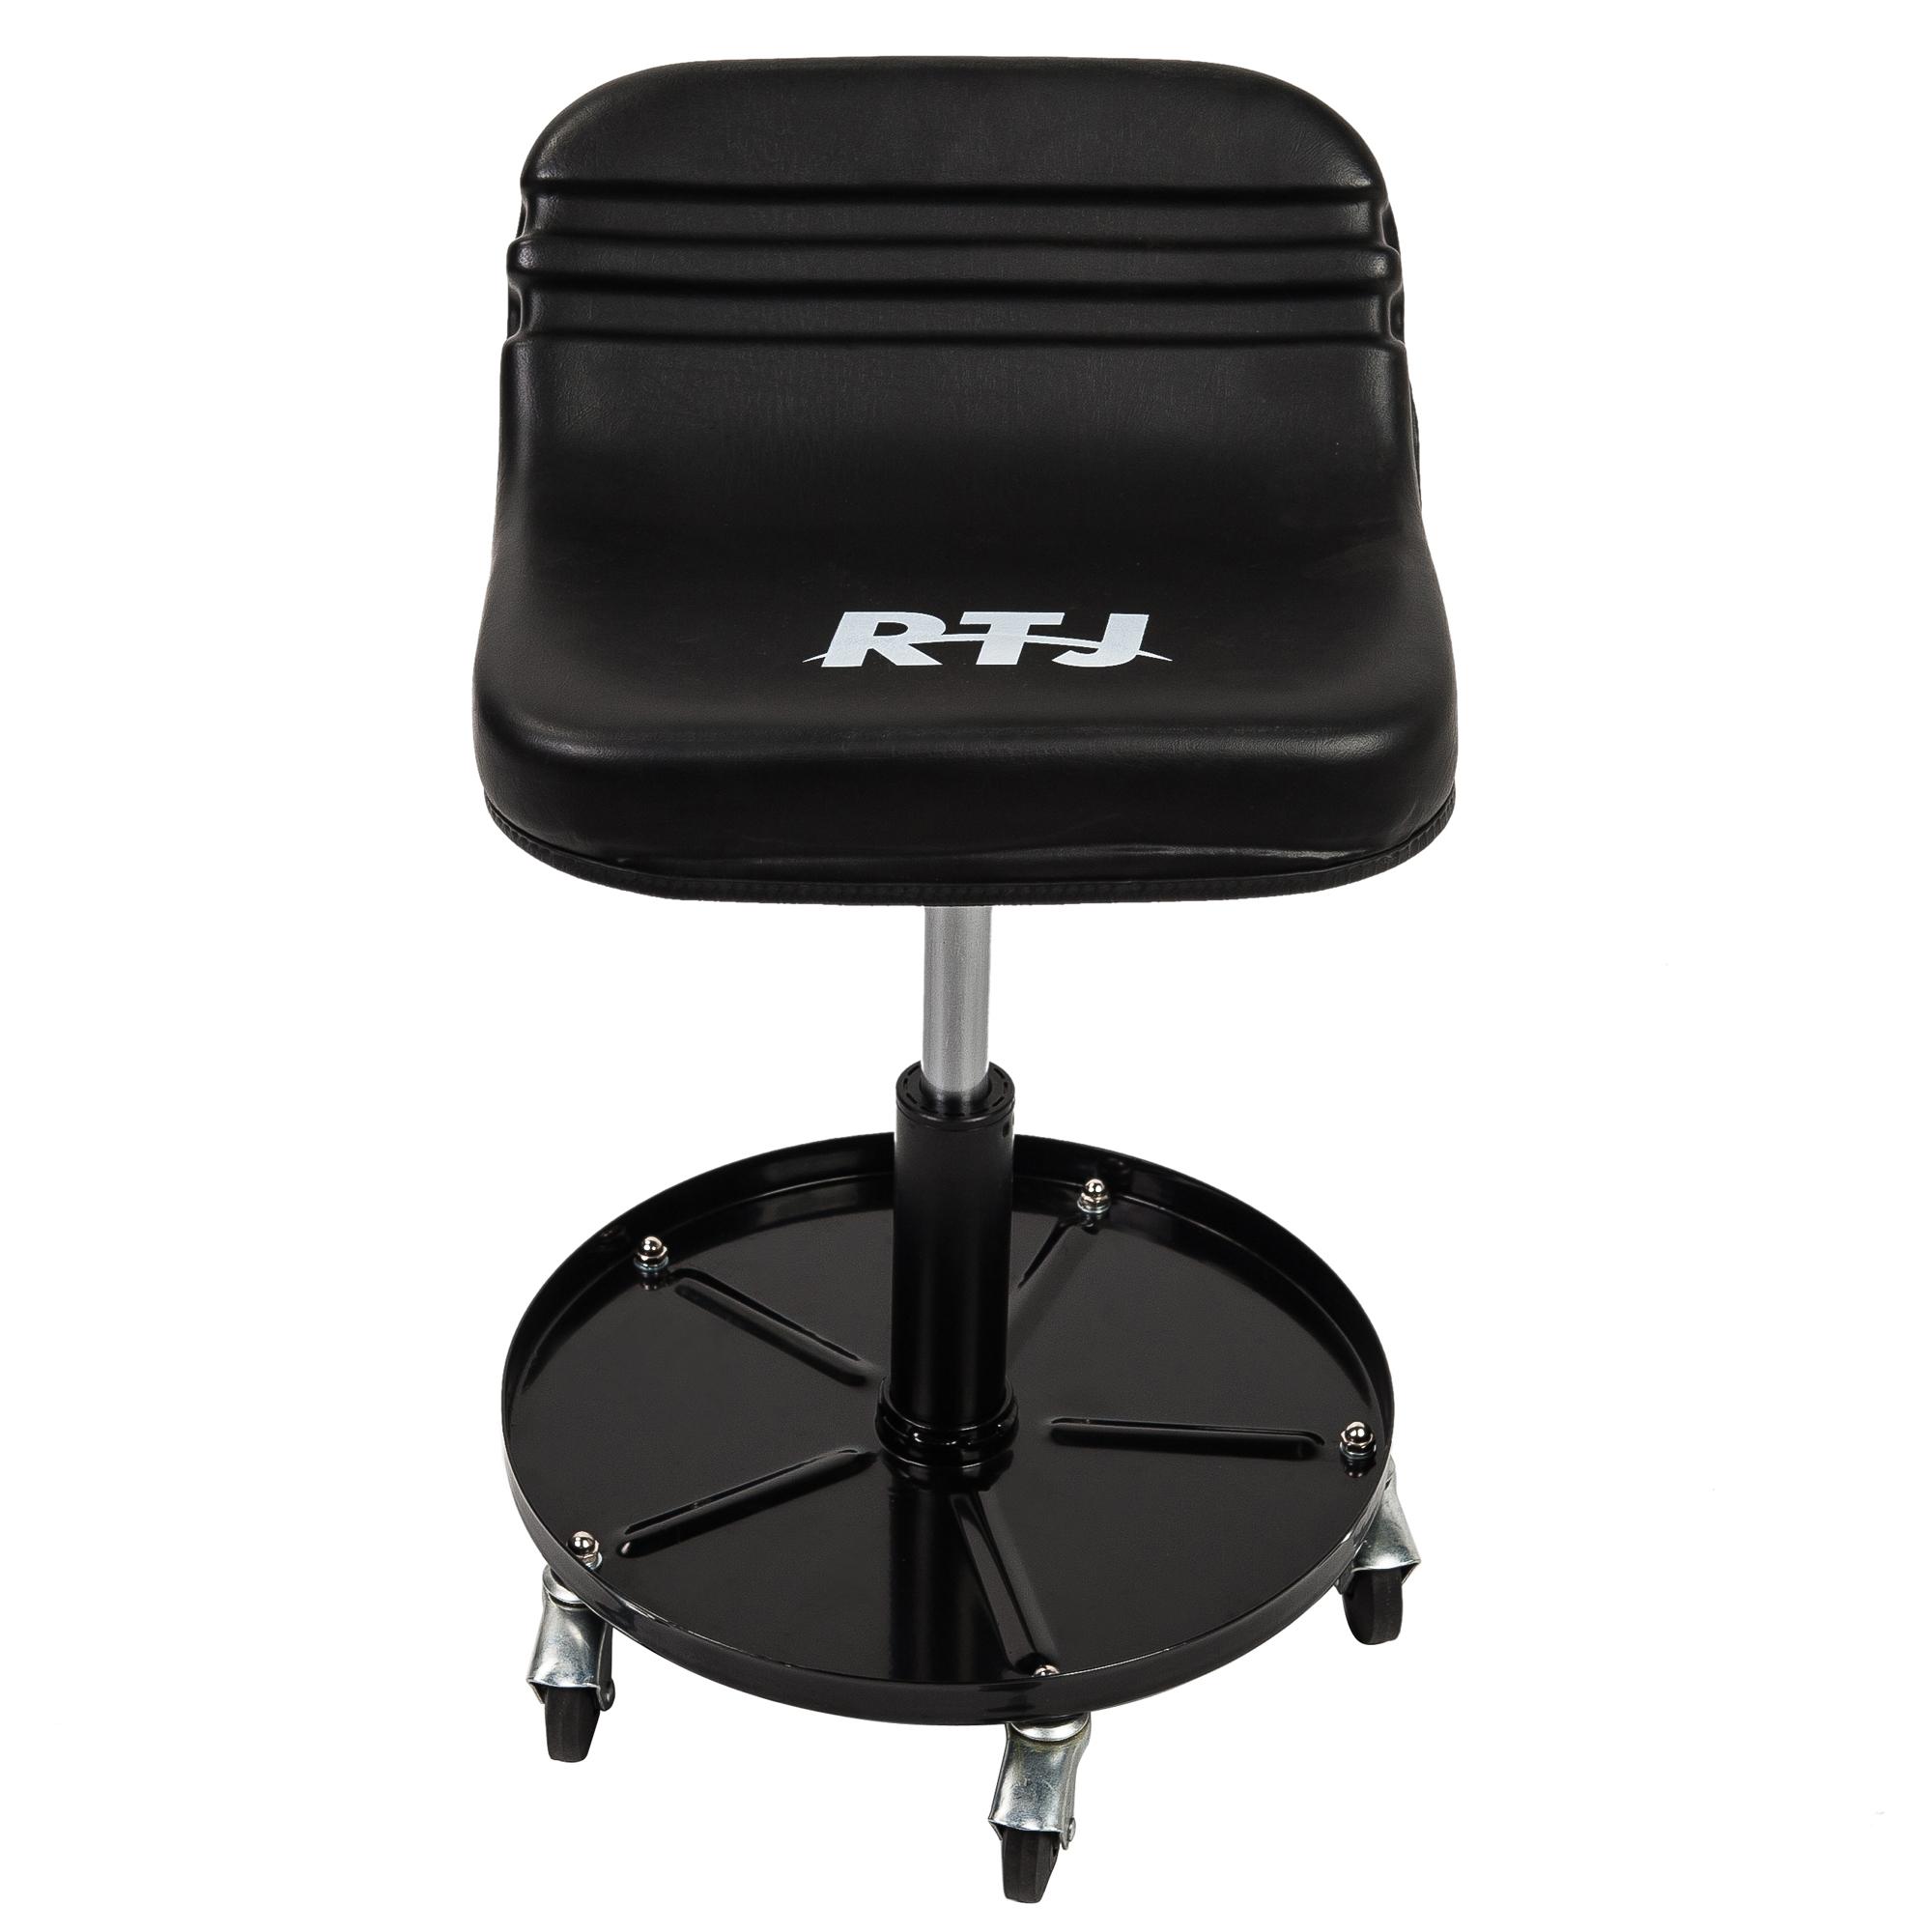 Pleasant Rtj 300 Lbs Capacity Pneumatic Mechanic Roller Seat Ibusinesslaw Wood Chair Design Ideas Ibusinesslaworg